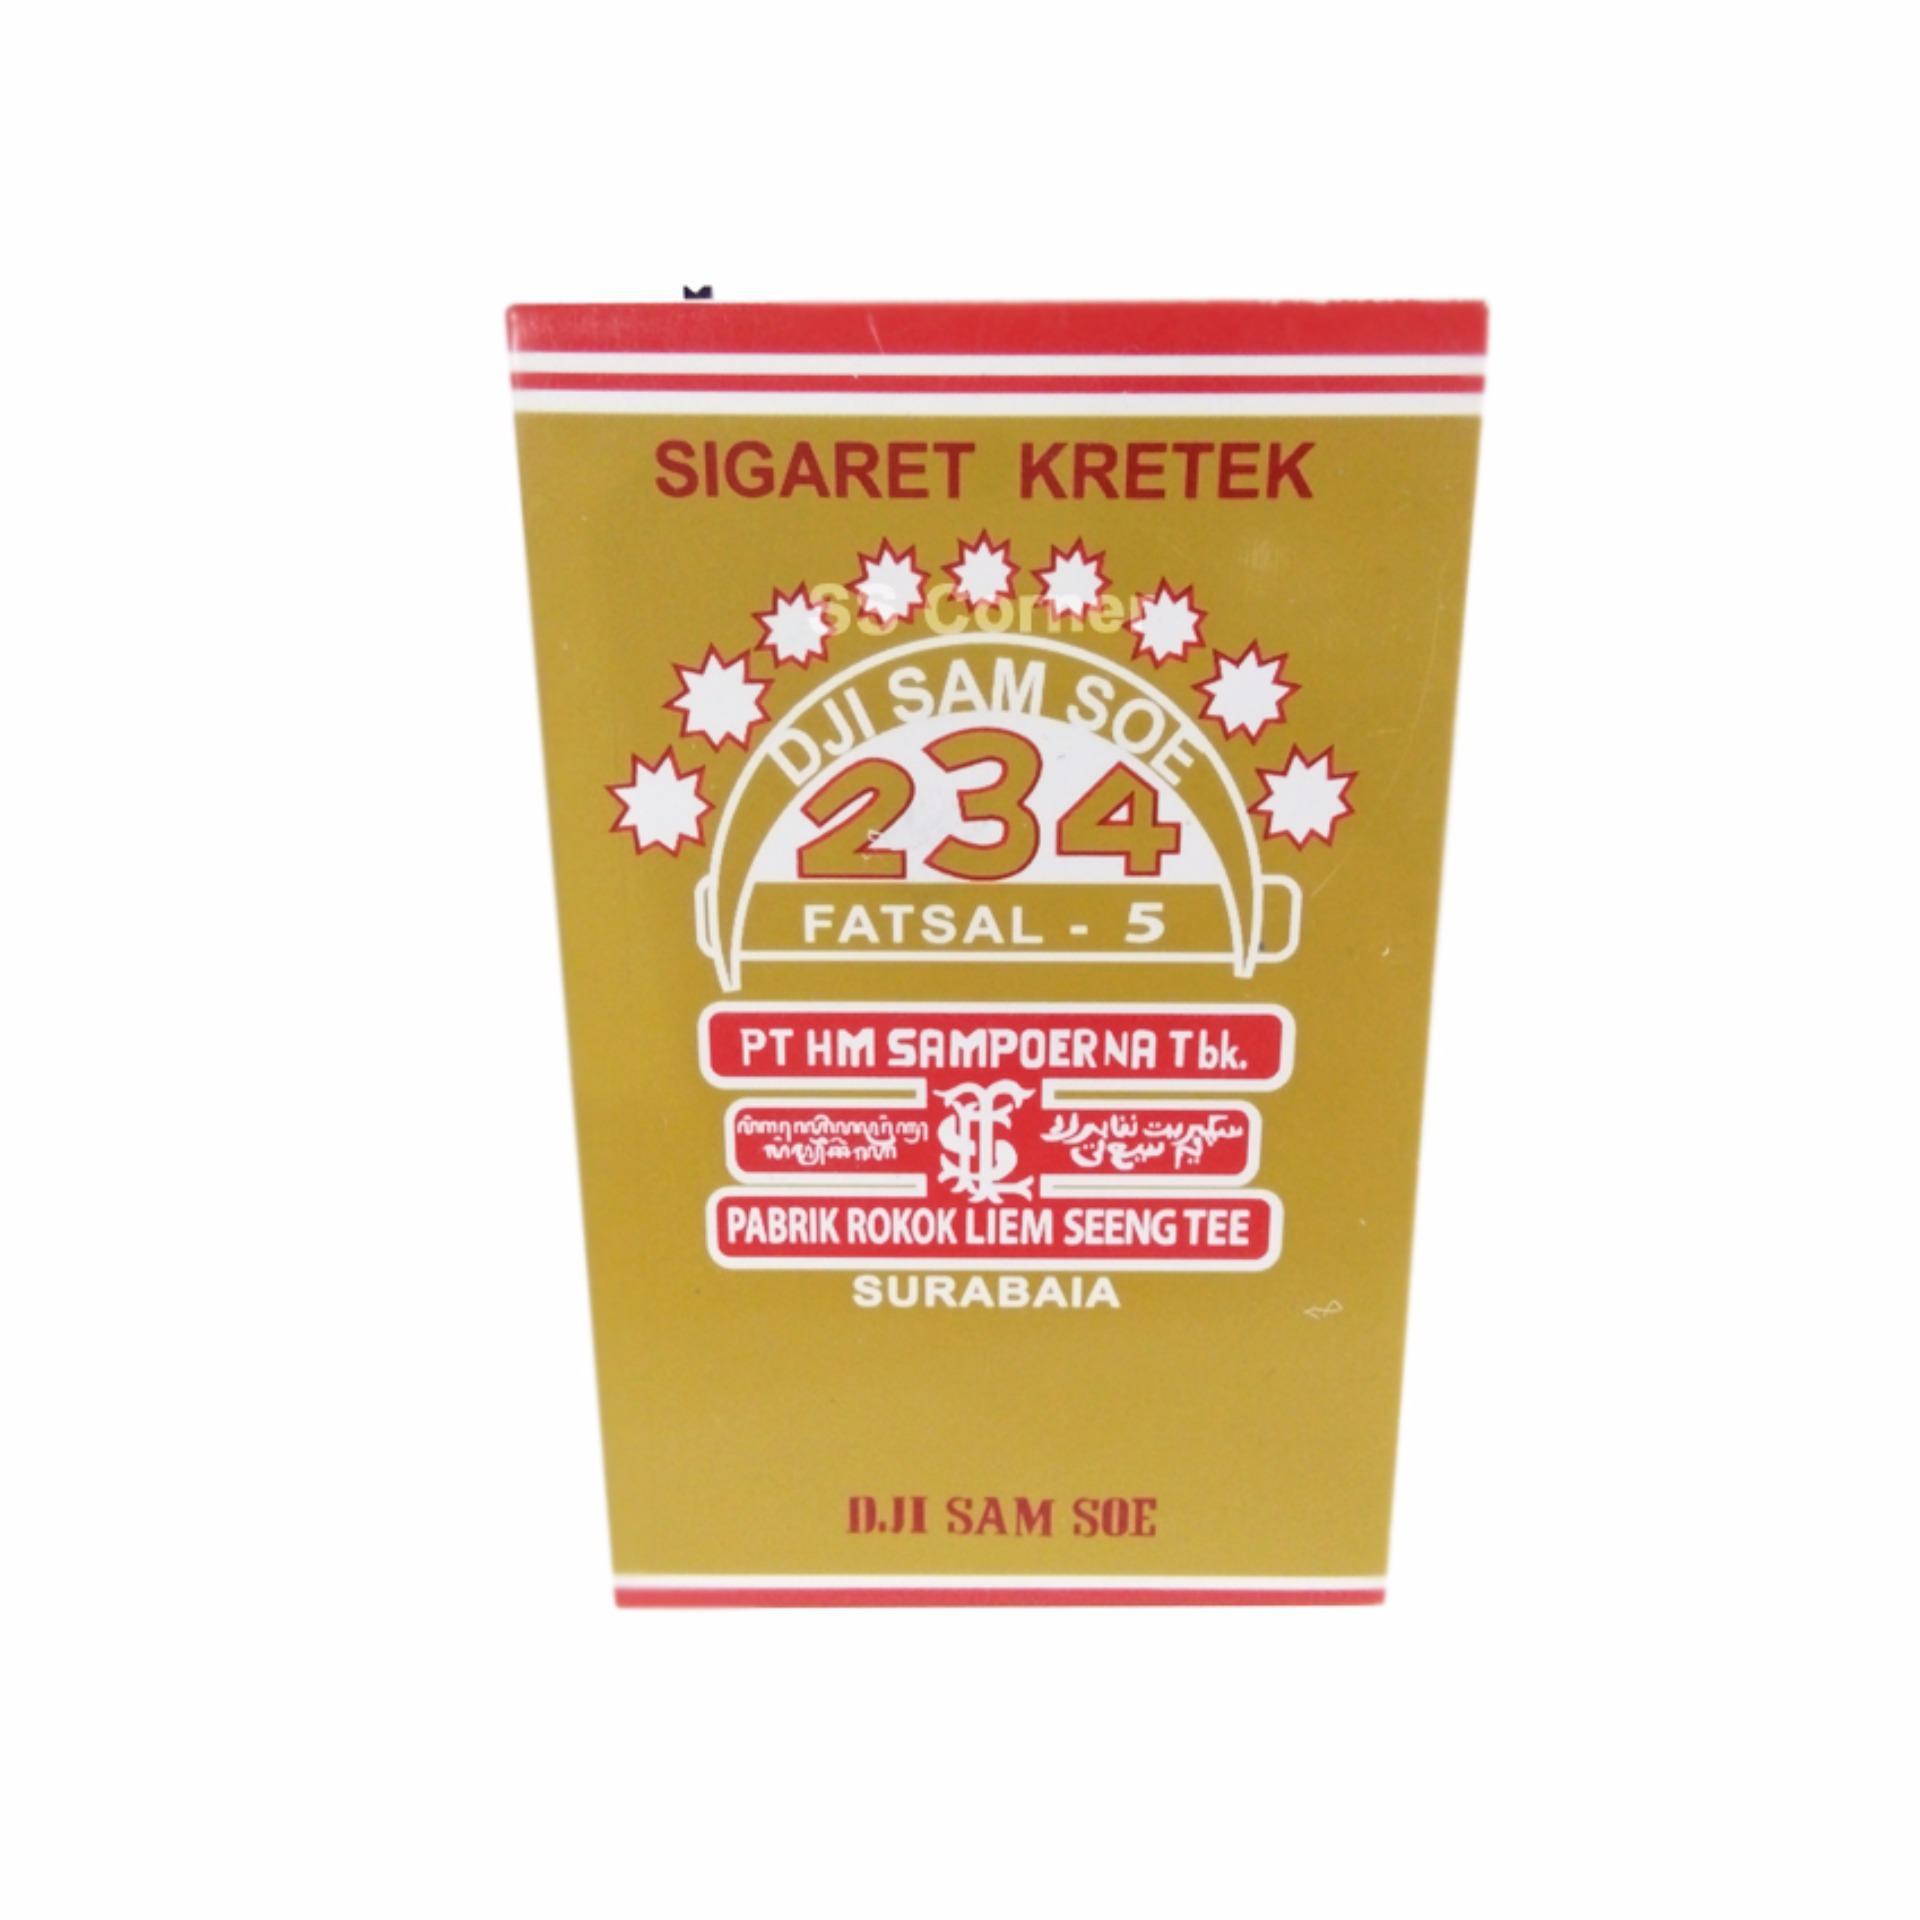 Tempat / Kotak Rokok Kaleng Motif Timbul Sampoerna Mild . Source · Mini Speaker Kotak Rokok